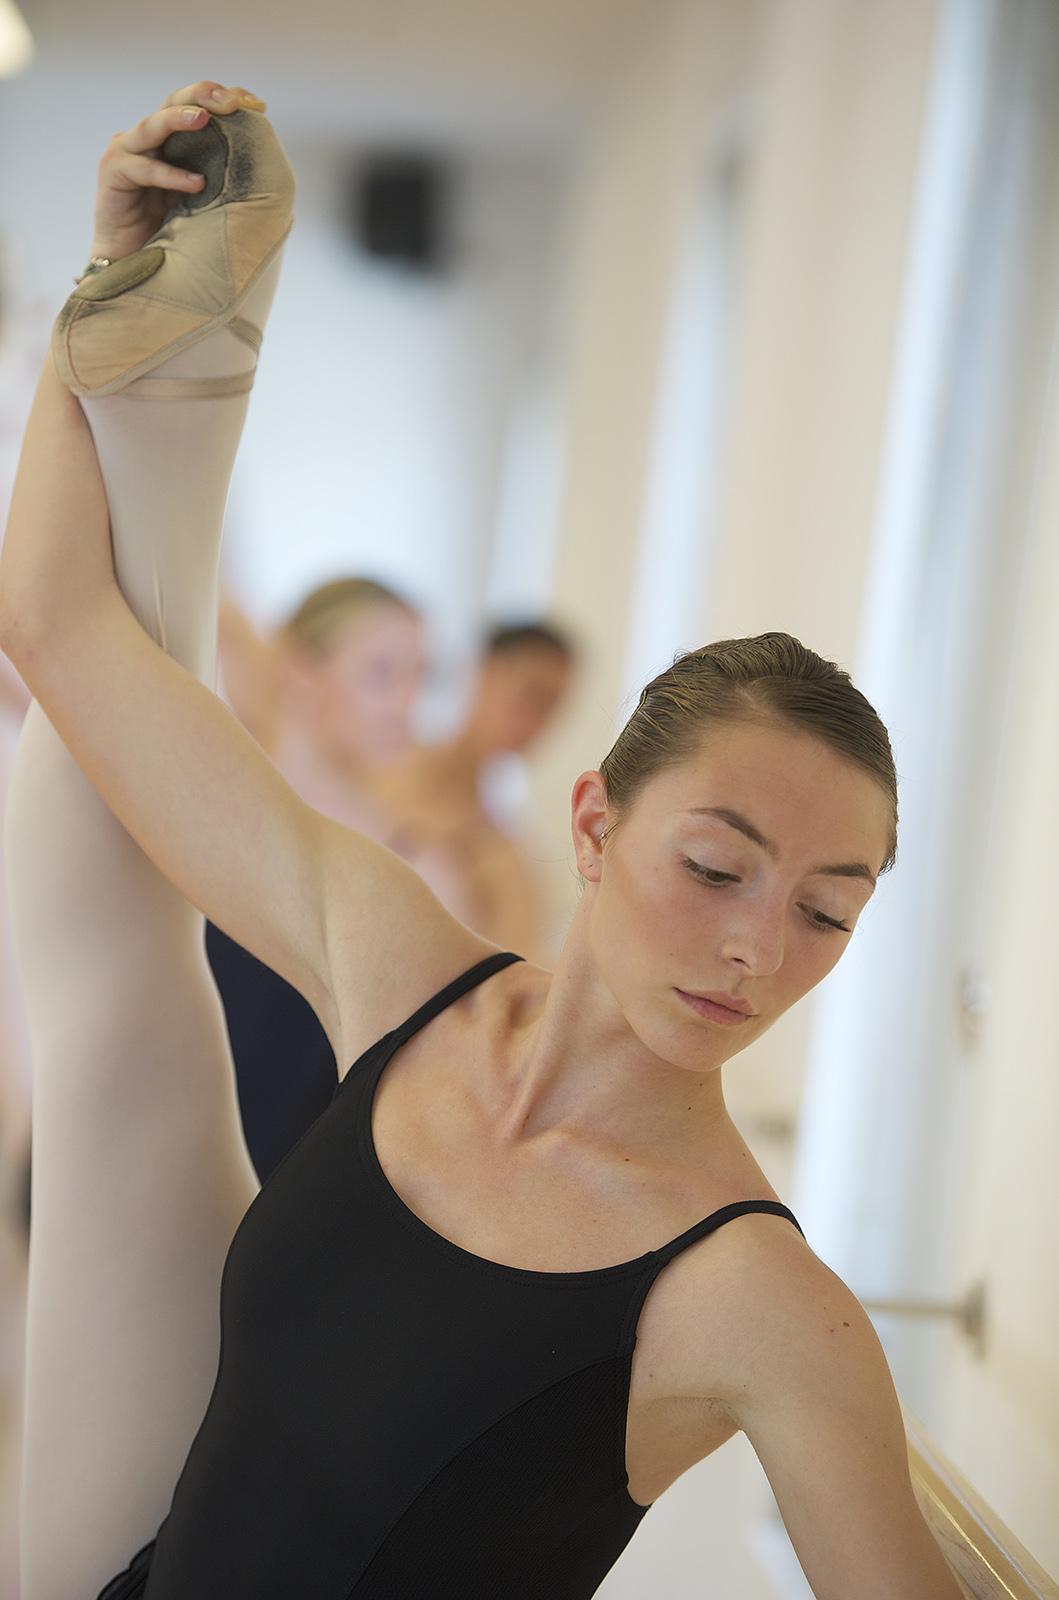 Ballet class in Italy